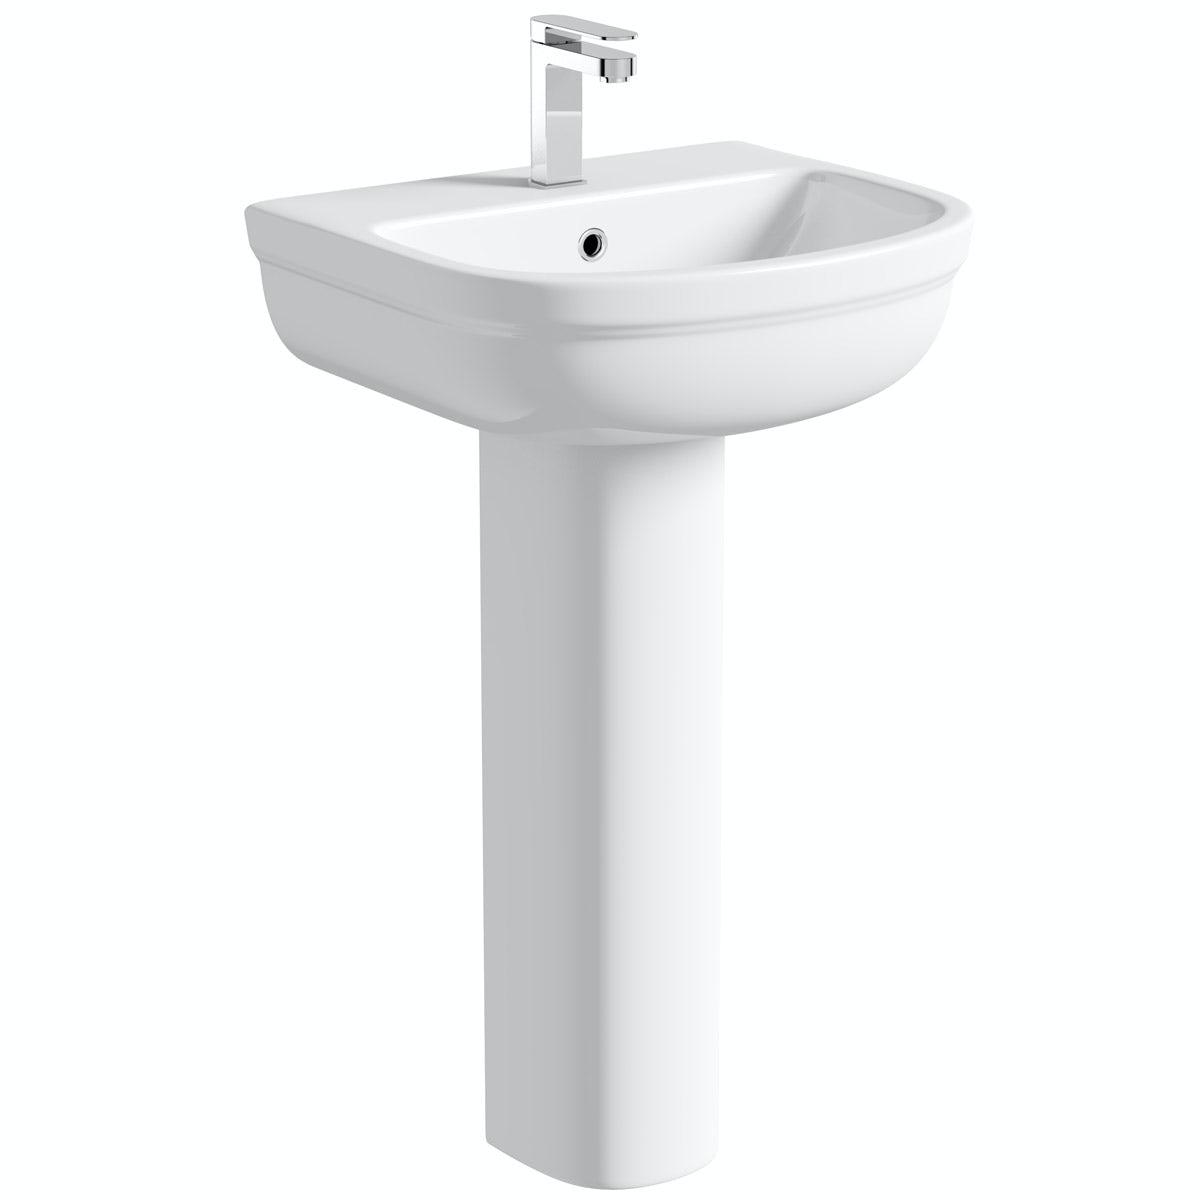 Orchard Deco 1 tap hole full pedestal basin 550mm